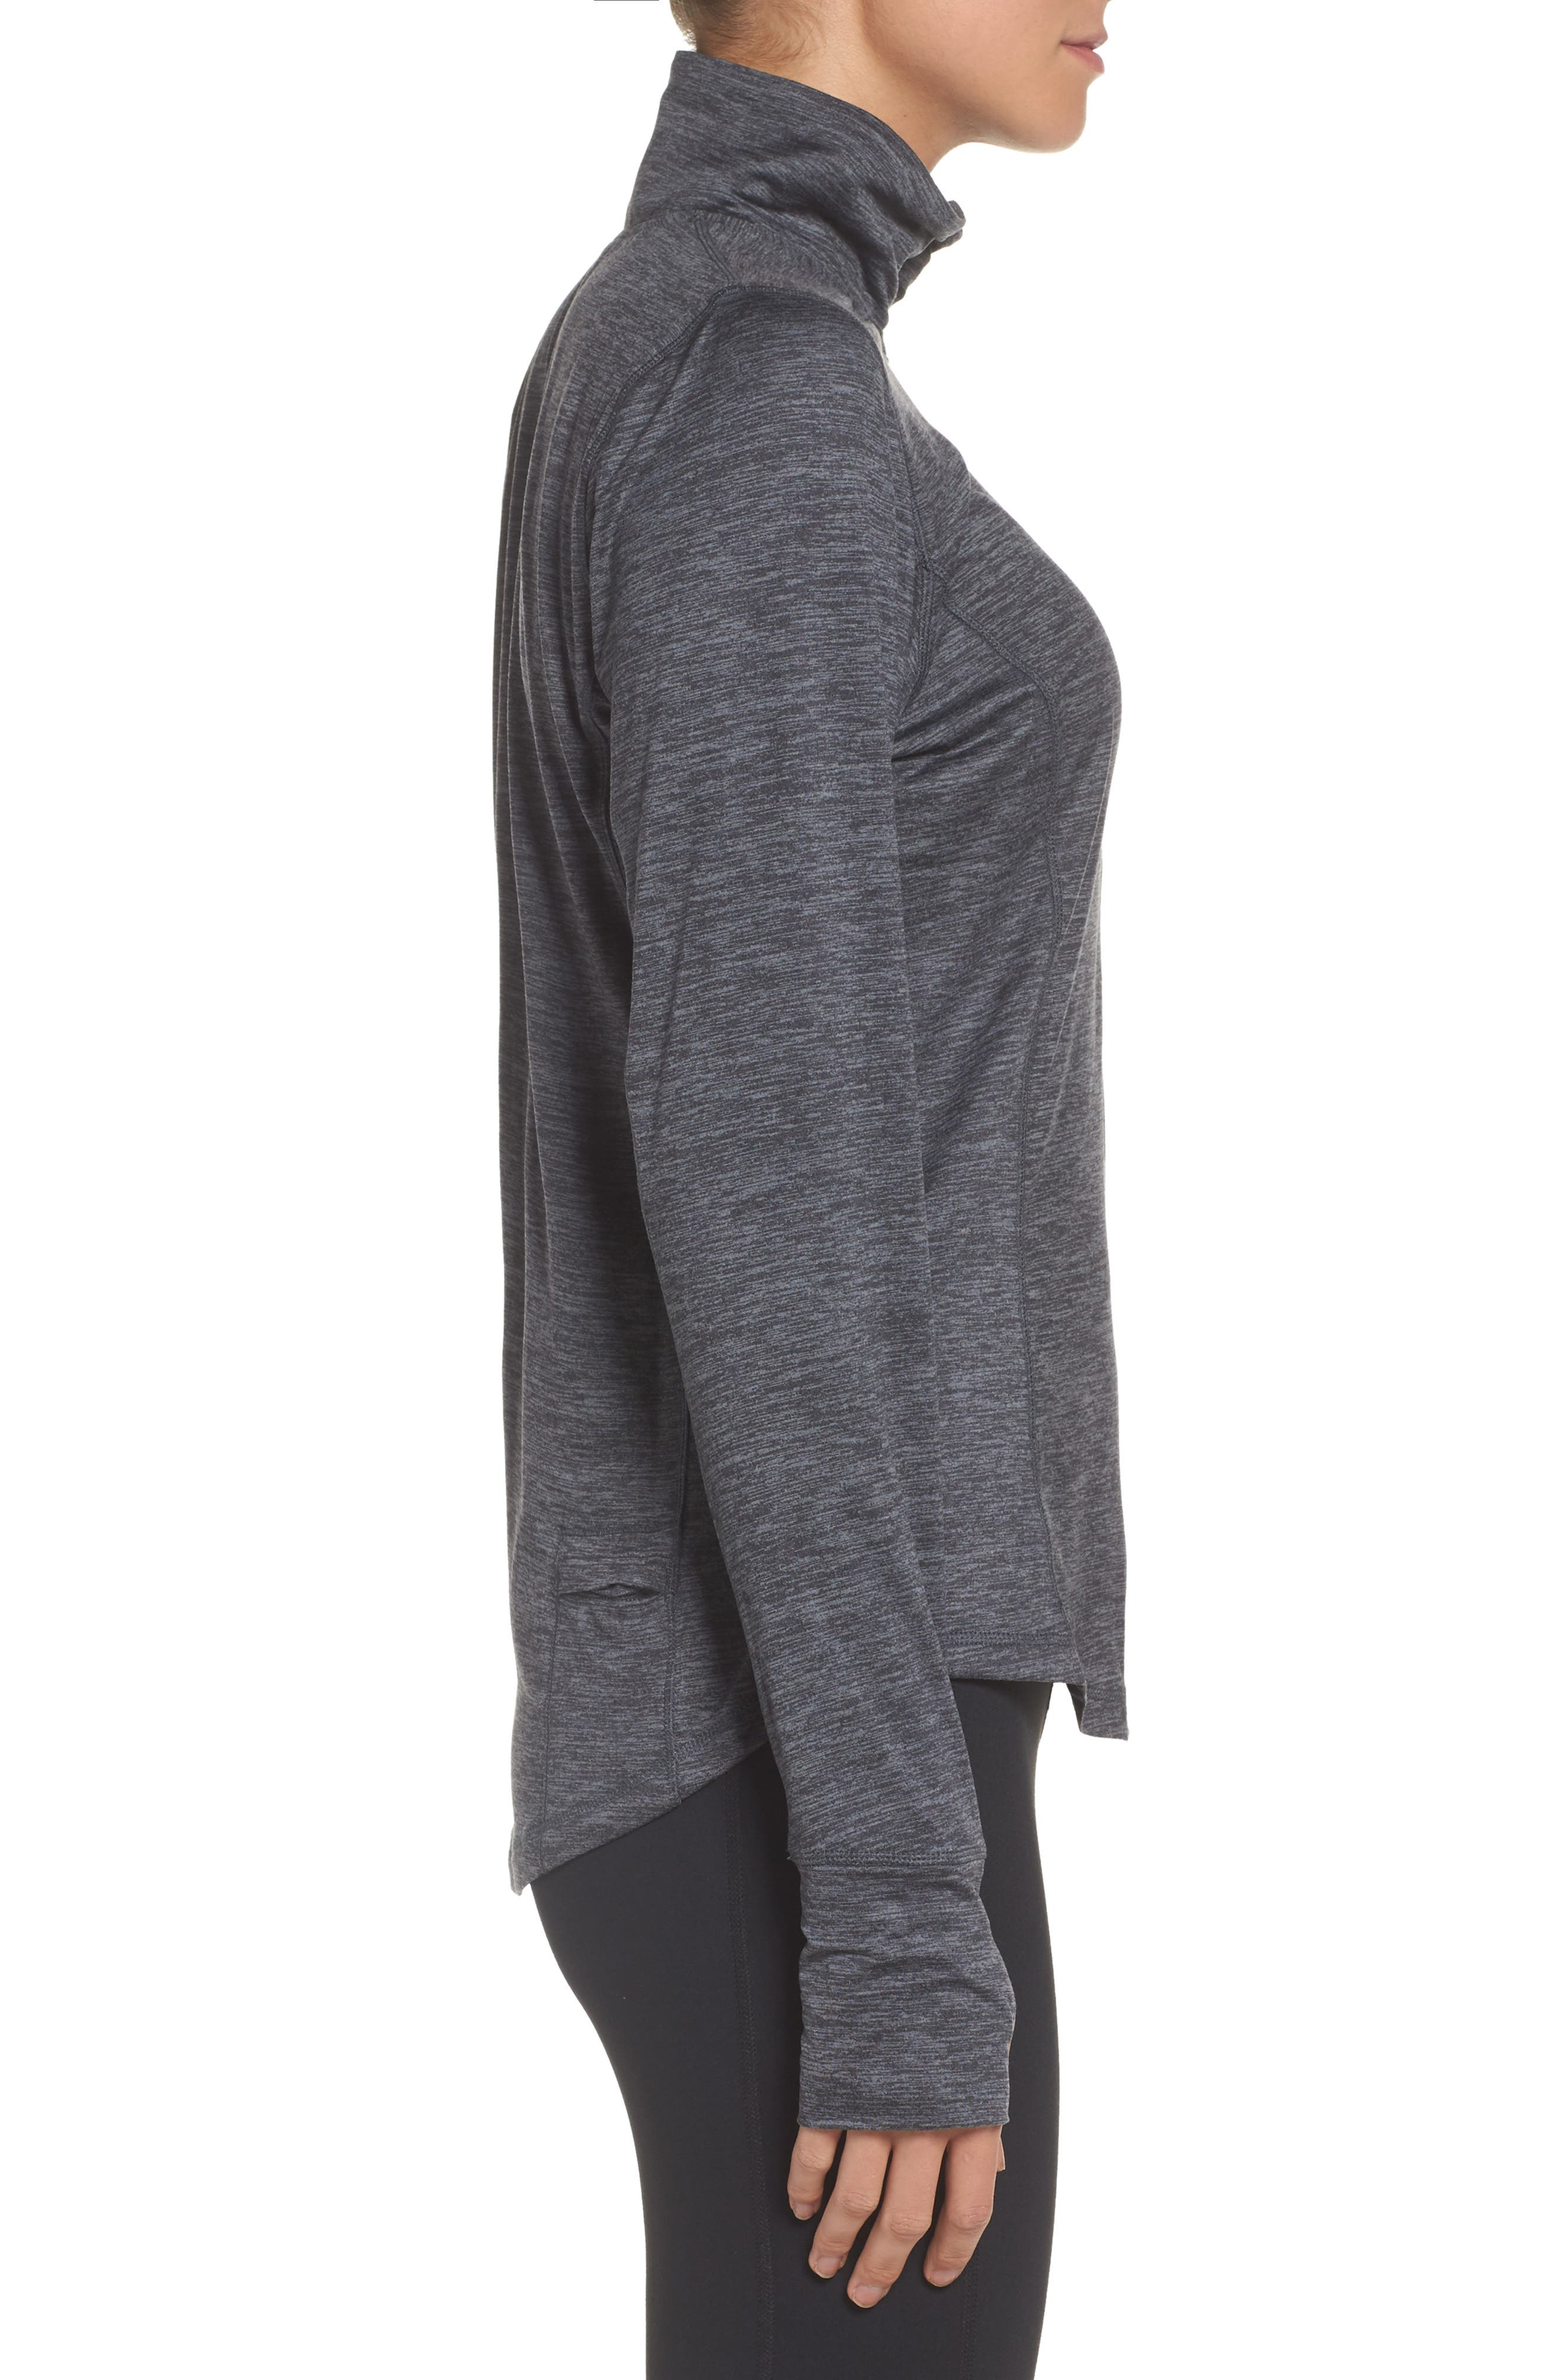 'Dash' Half Zip Jacket,                             Alternate thumbnail 3, color,                             HEATHER ASPHALT